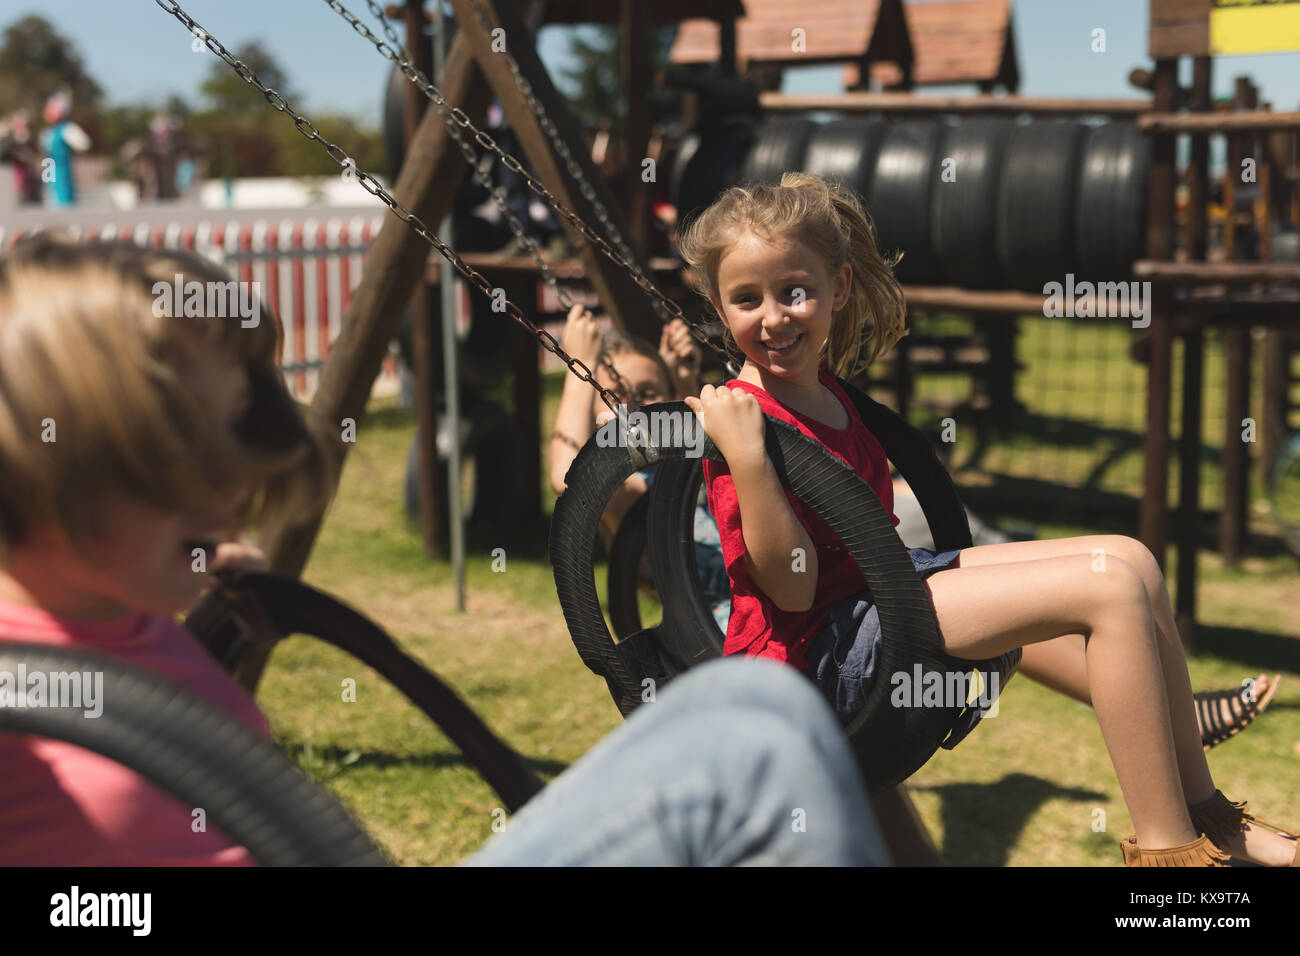 Children swinging on tire swing - Stock Image